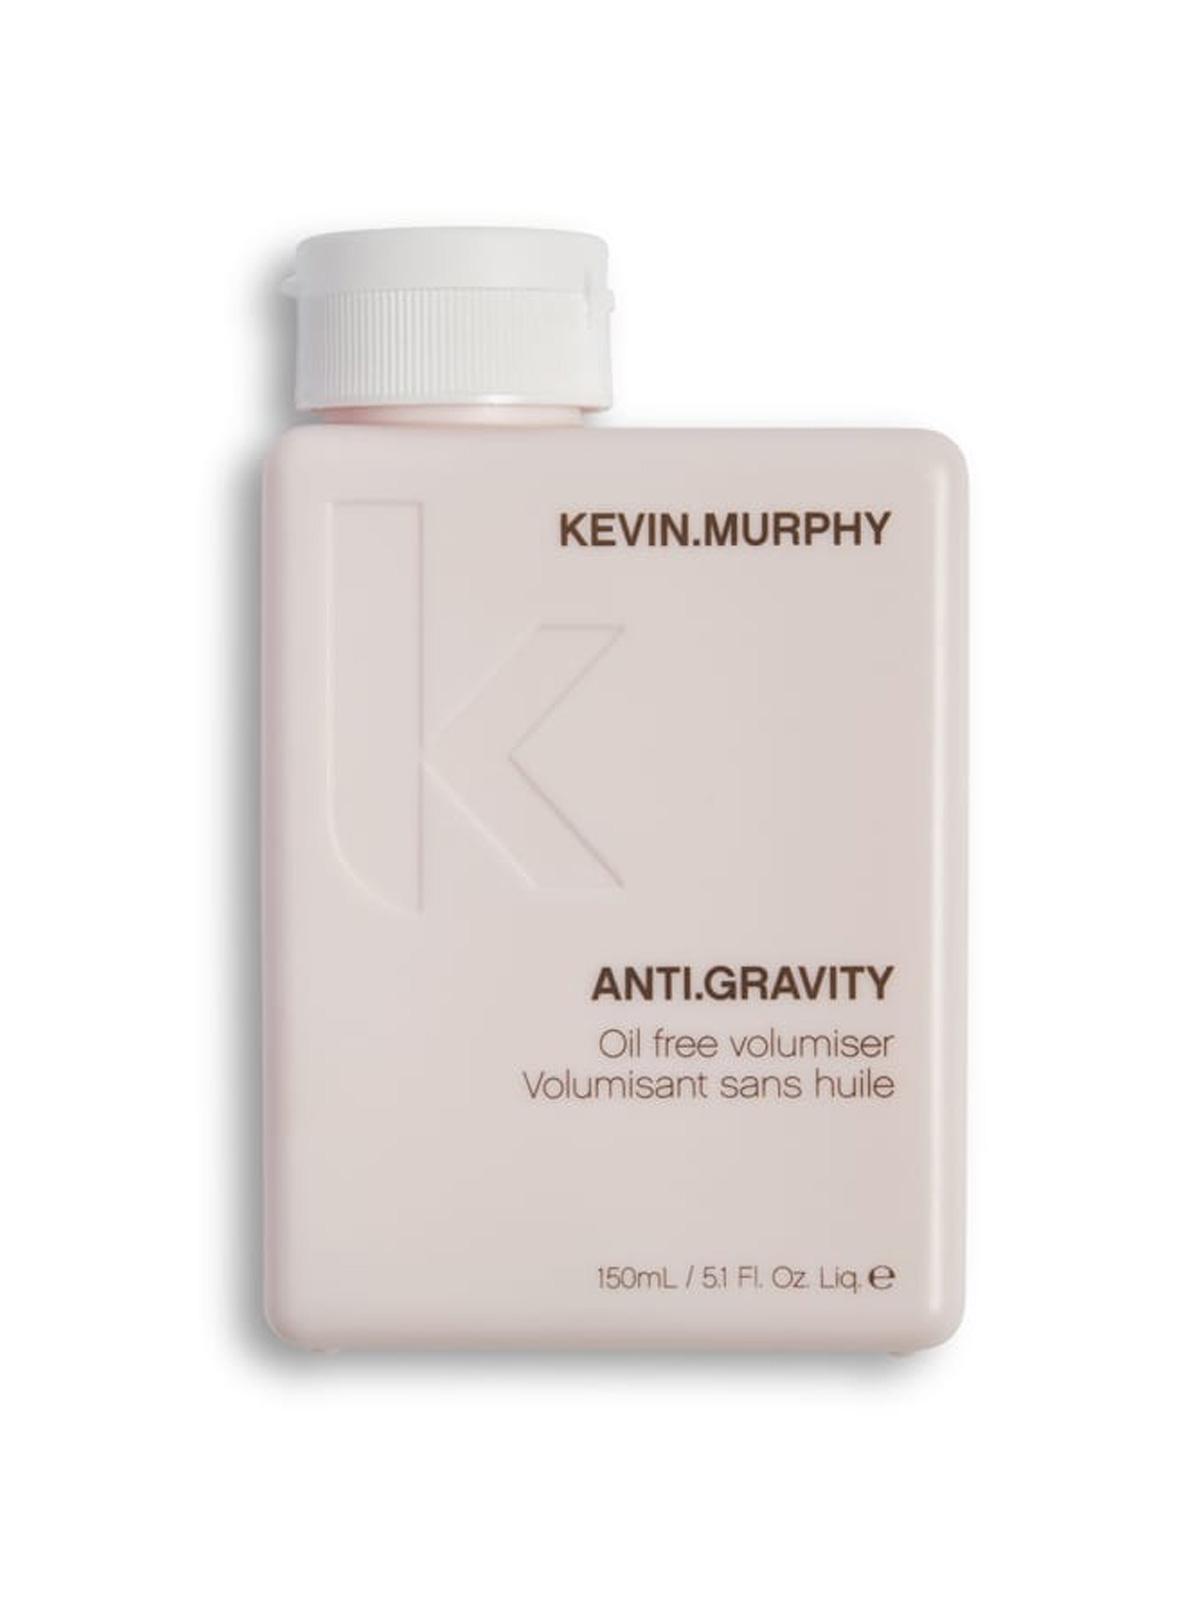 KEVIN.MURPHY ANTI.GRAVITY